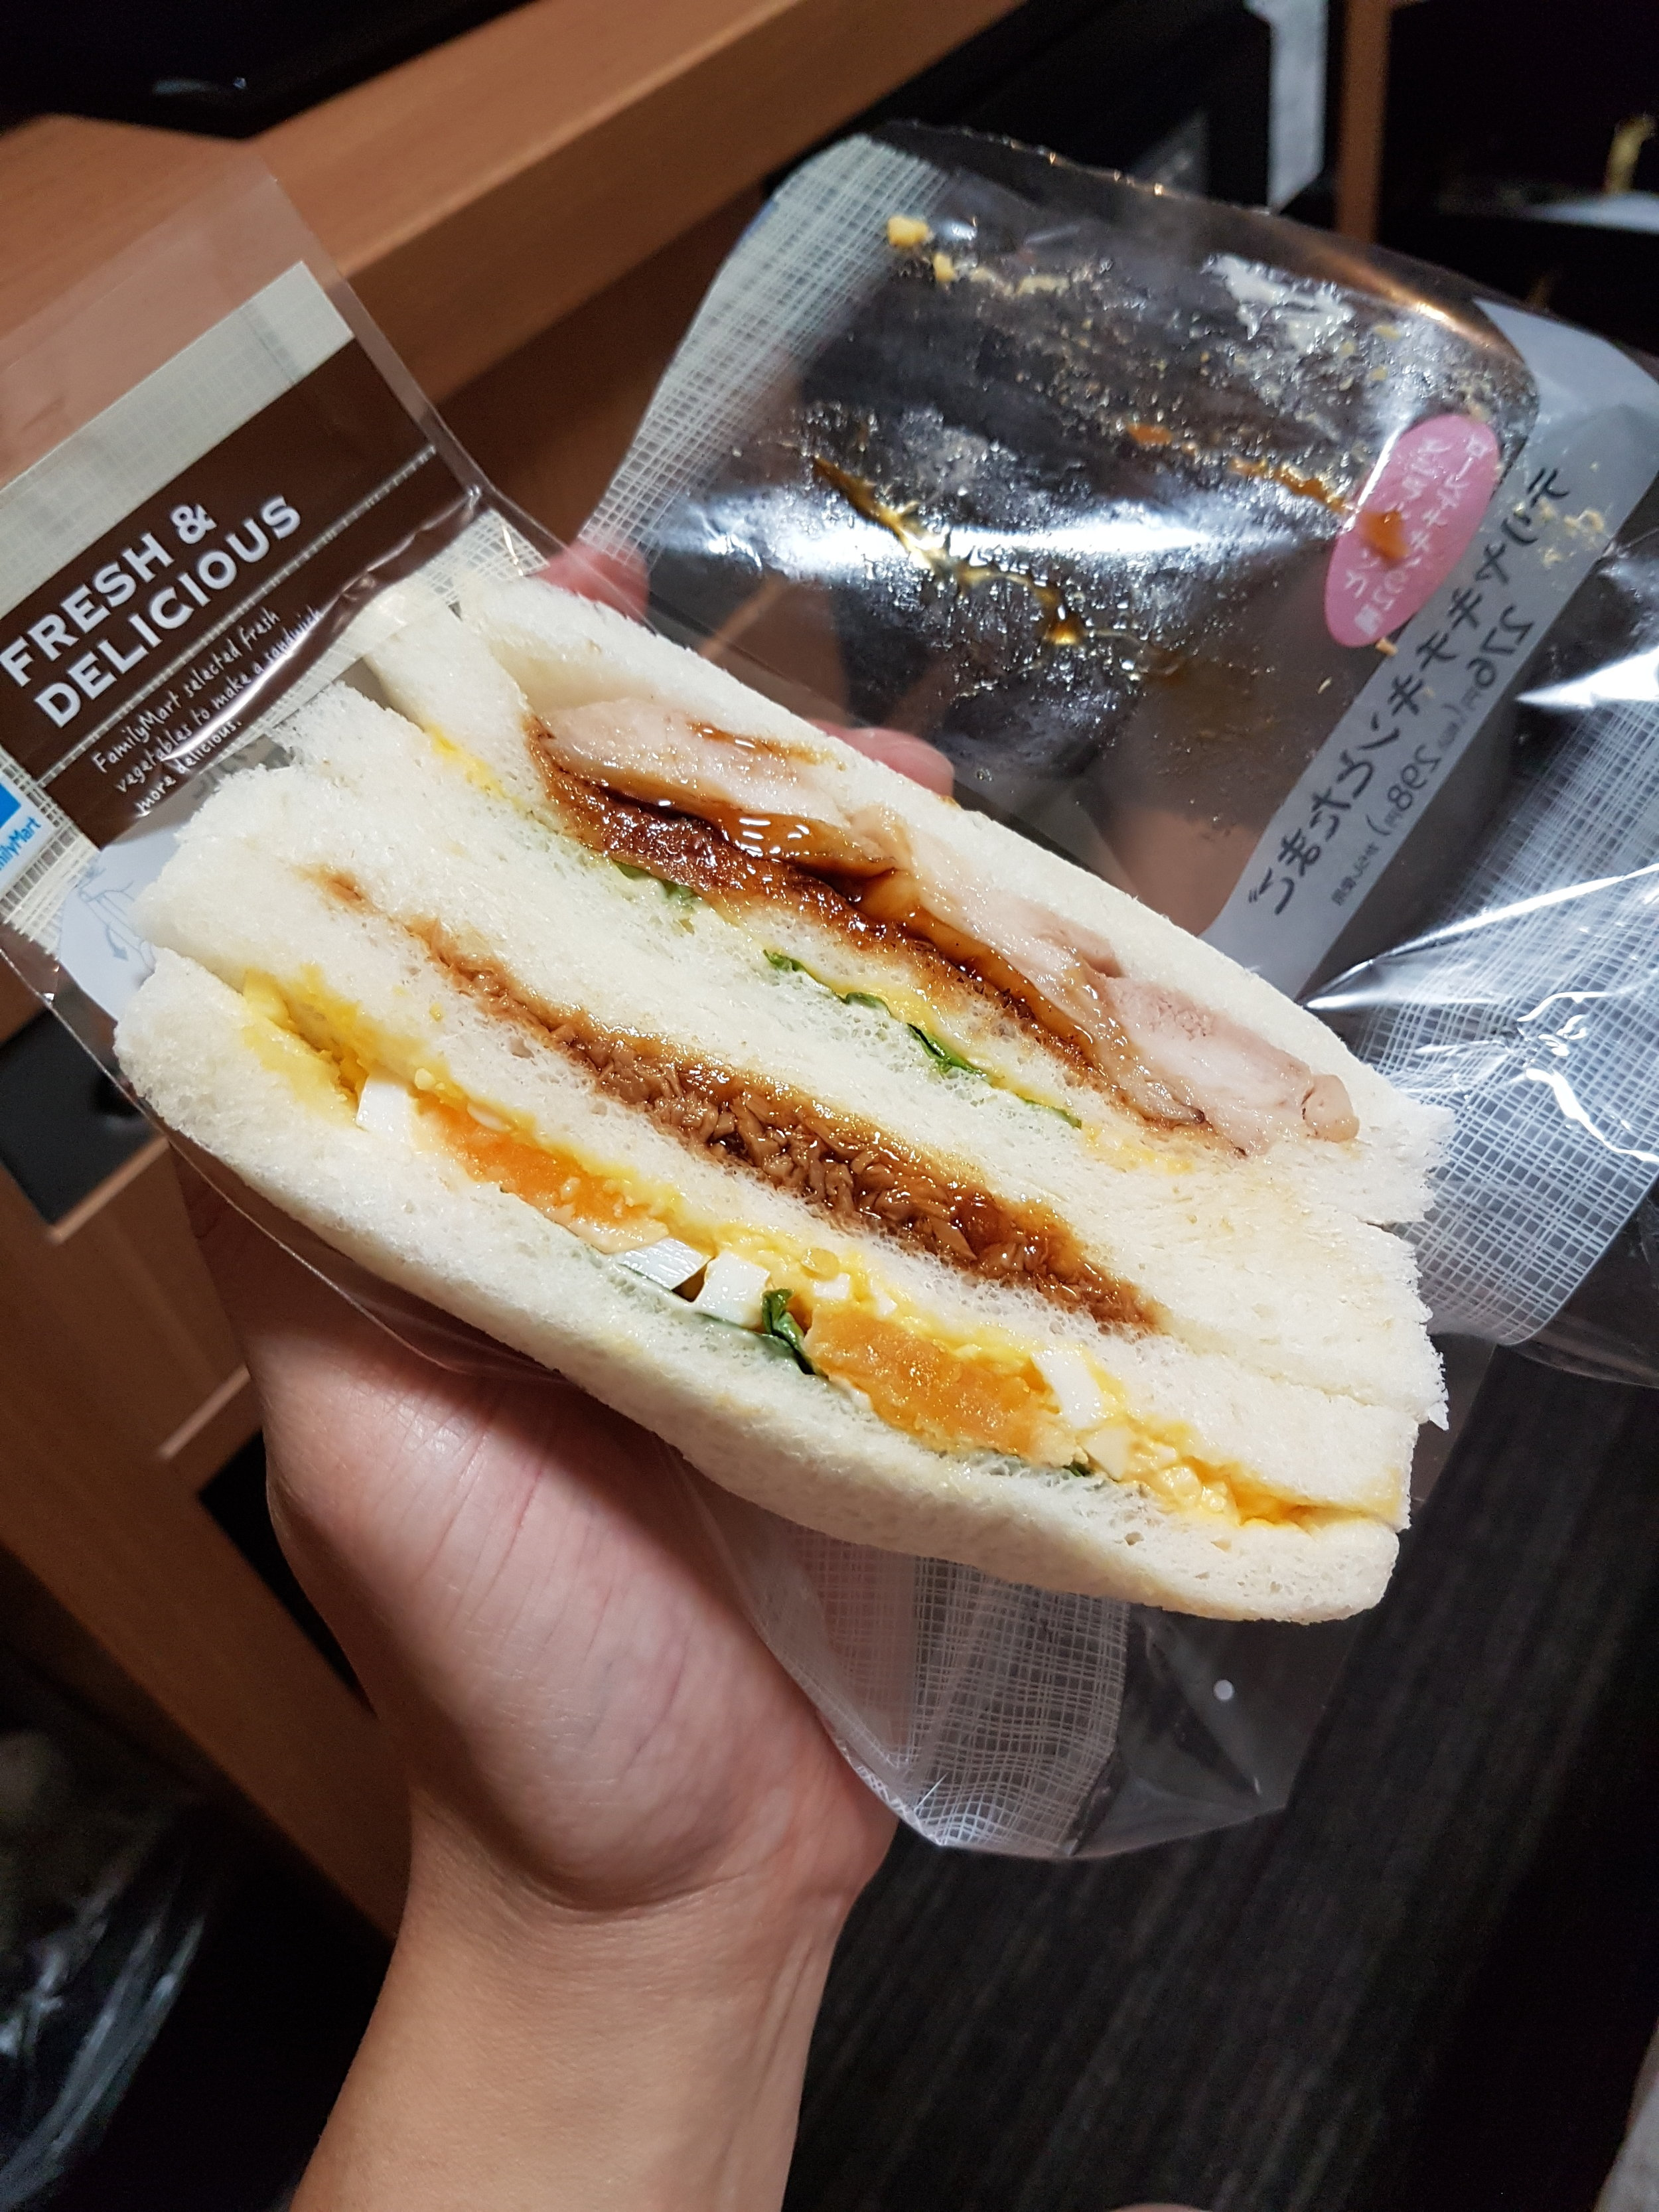 Family Mart's sandwiches... egg salad + chicken teriyaki and ground pork!